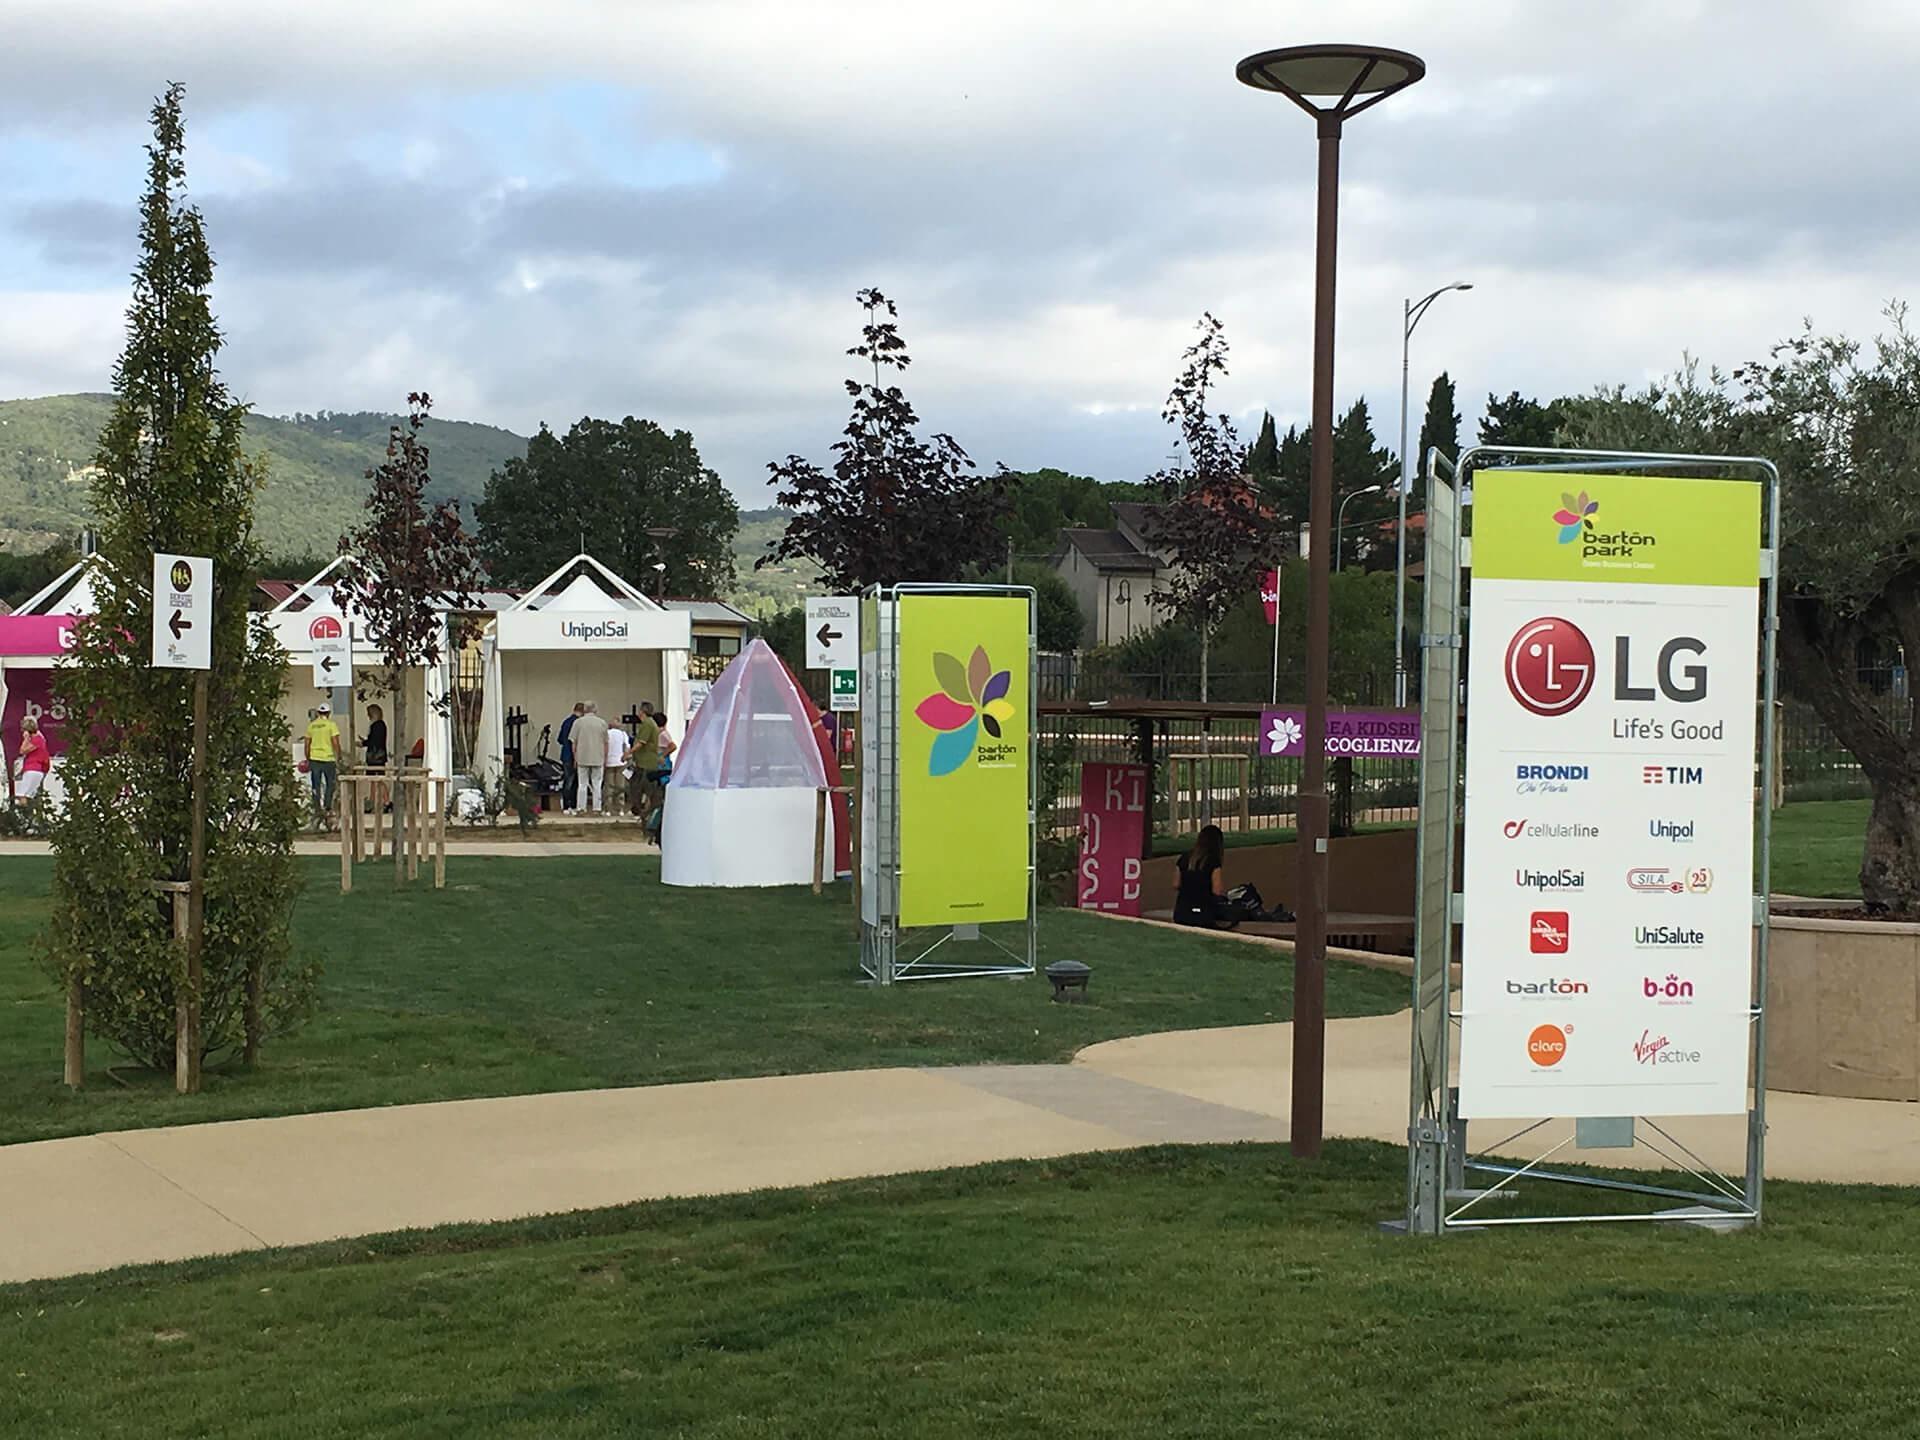 Allestimenti Grafox - Sport & Wellness - Barton Park - Barton Park Day - Perugia